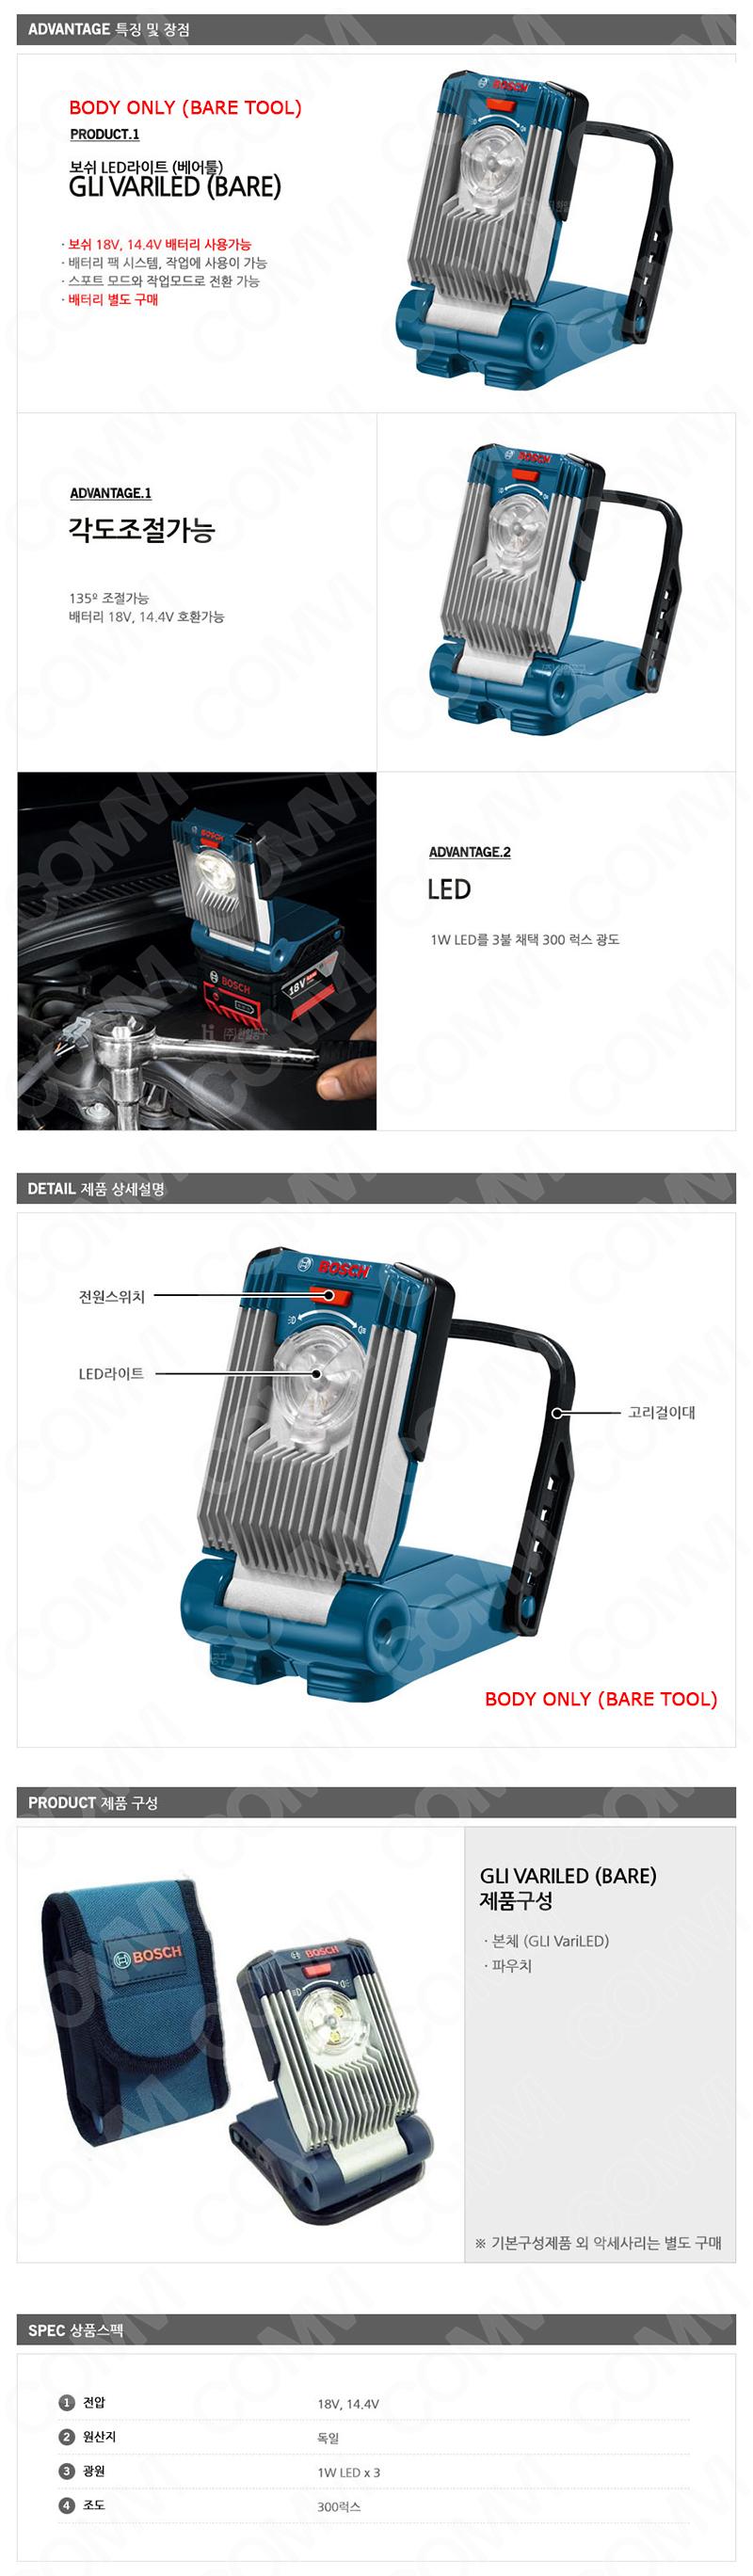 BOSCH Battery Light GLI VARI LED Tool only Free Shipping W